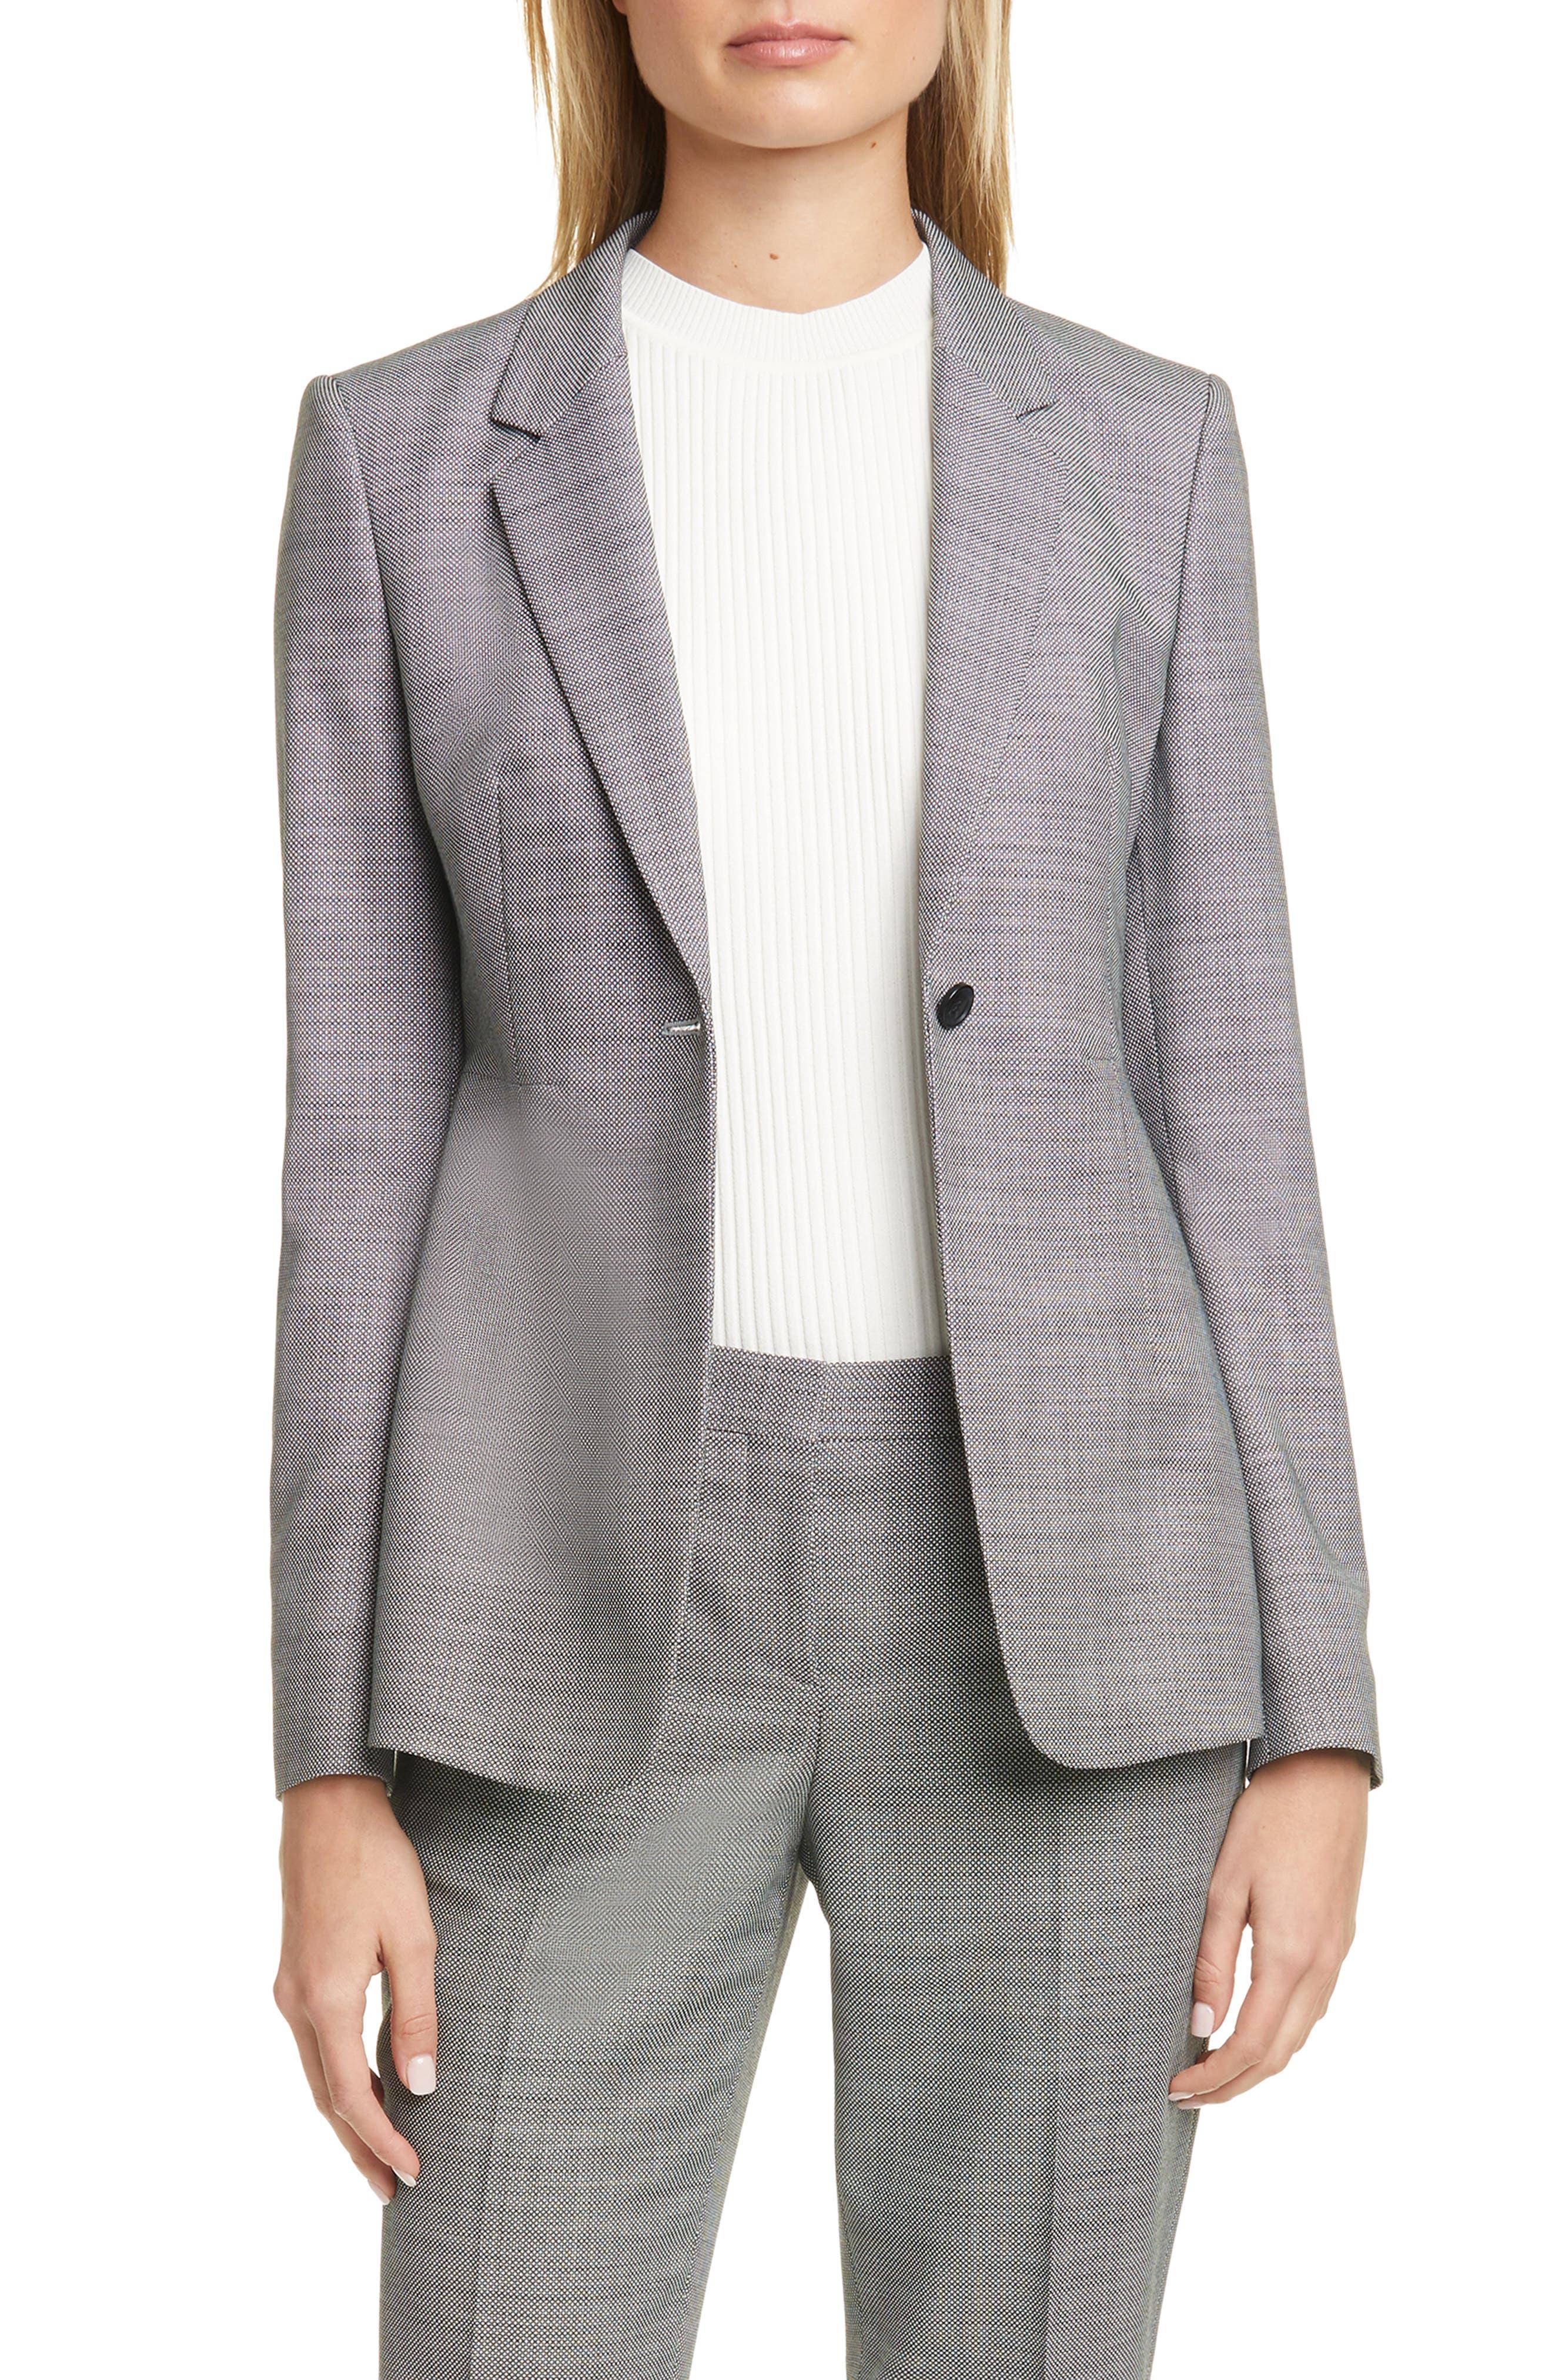 BOSS Jalaia Bird's Eye Suit Jacket